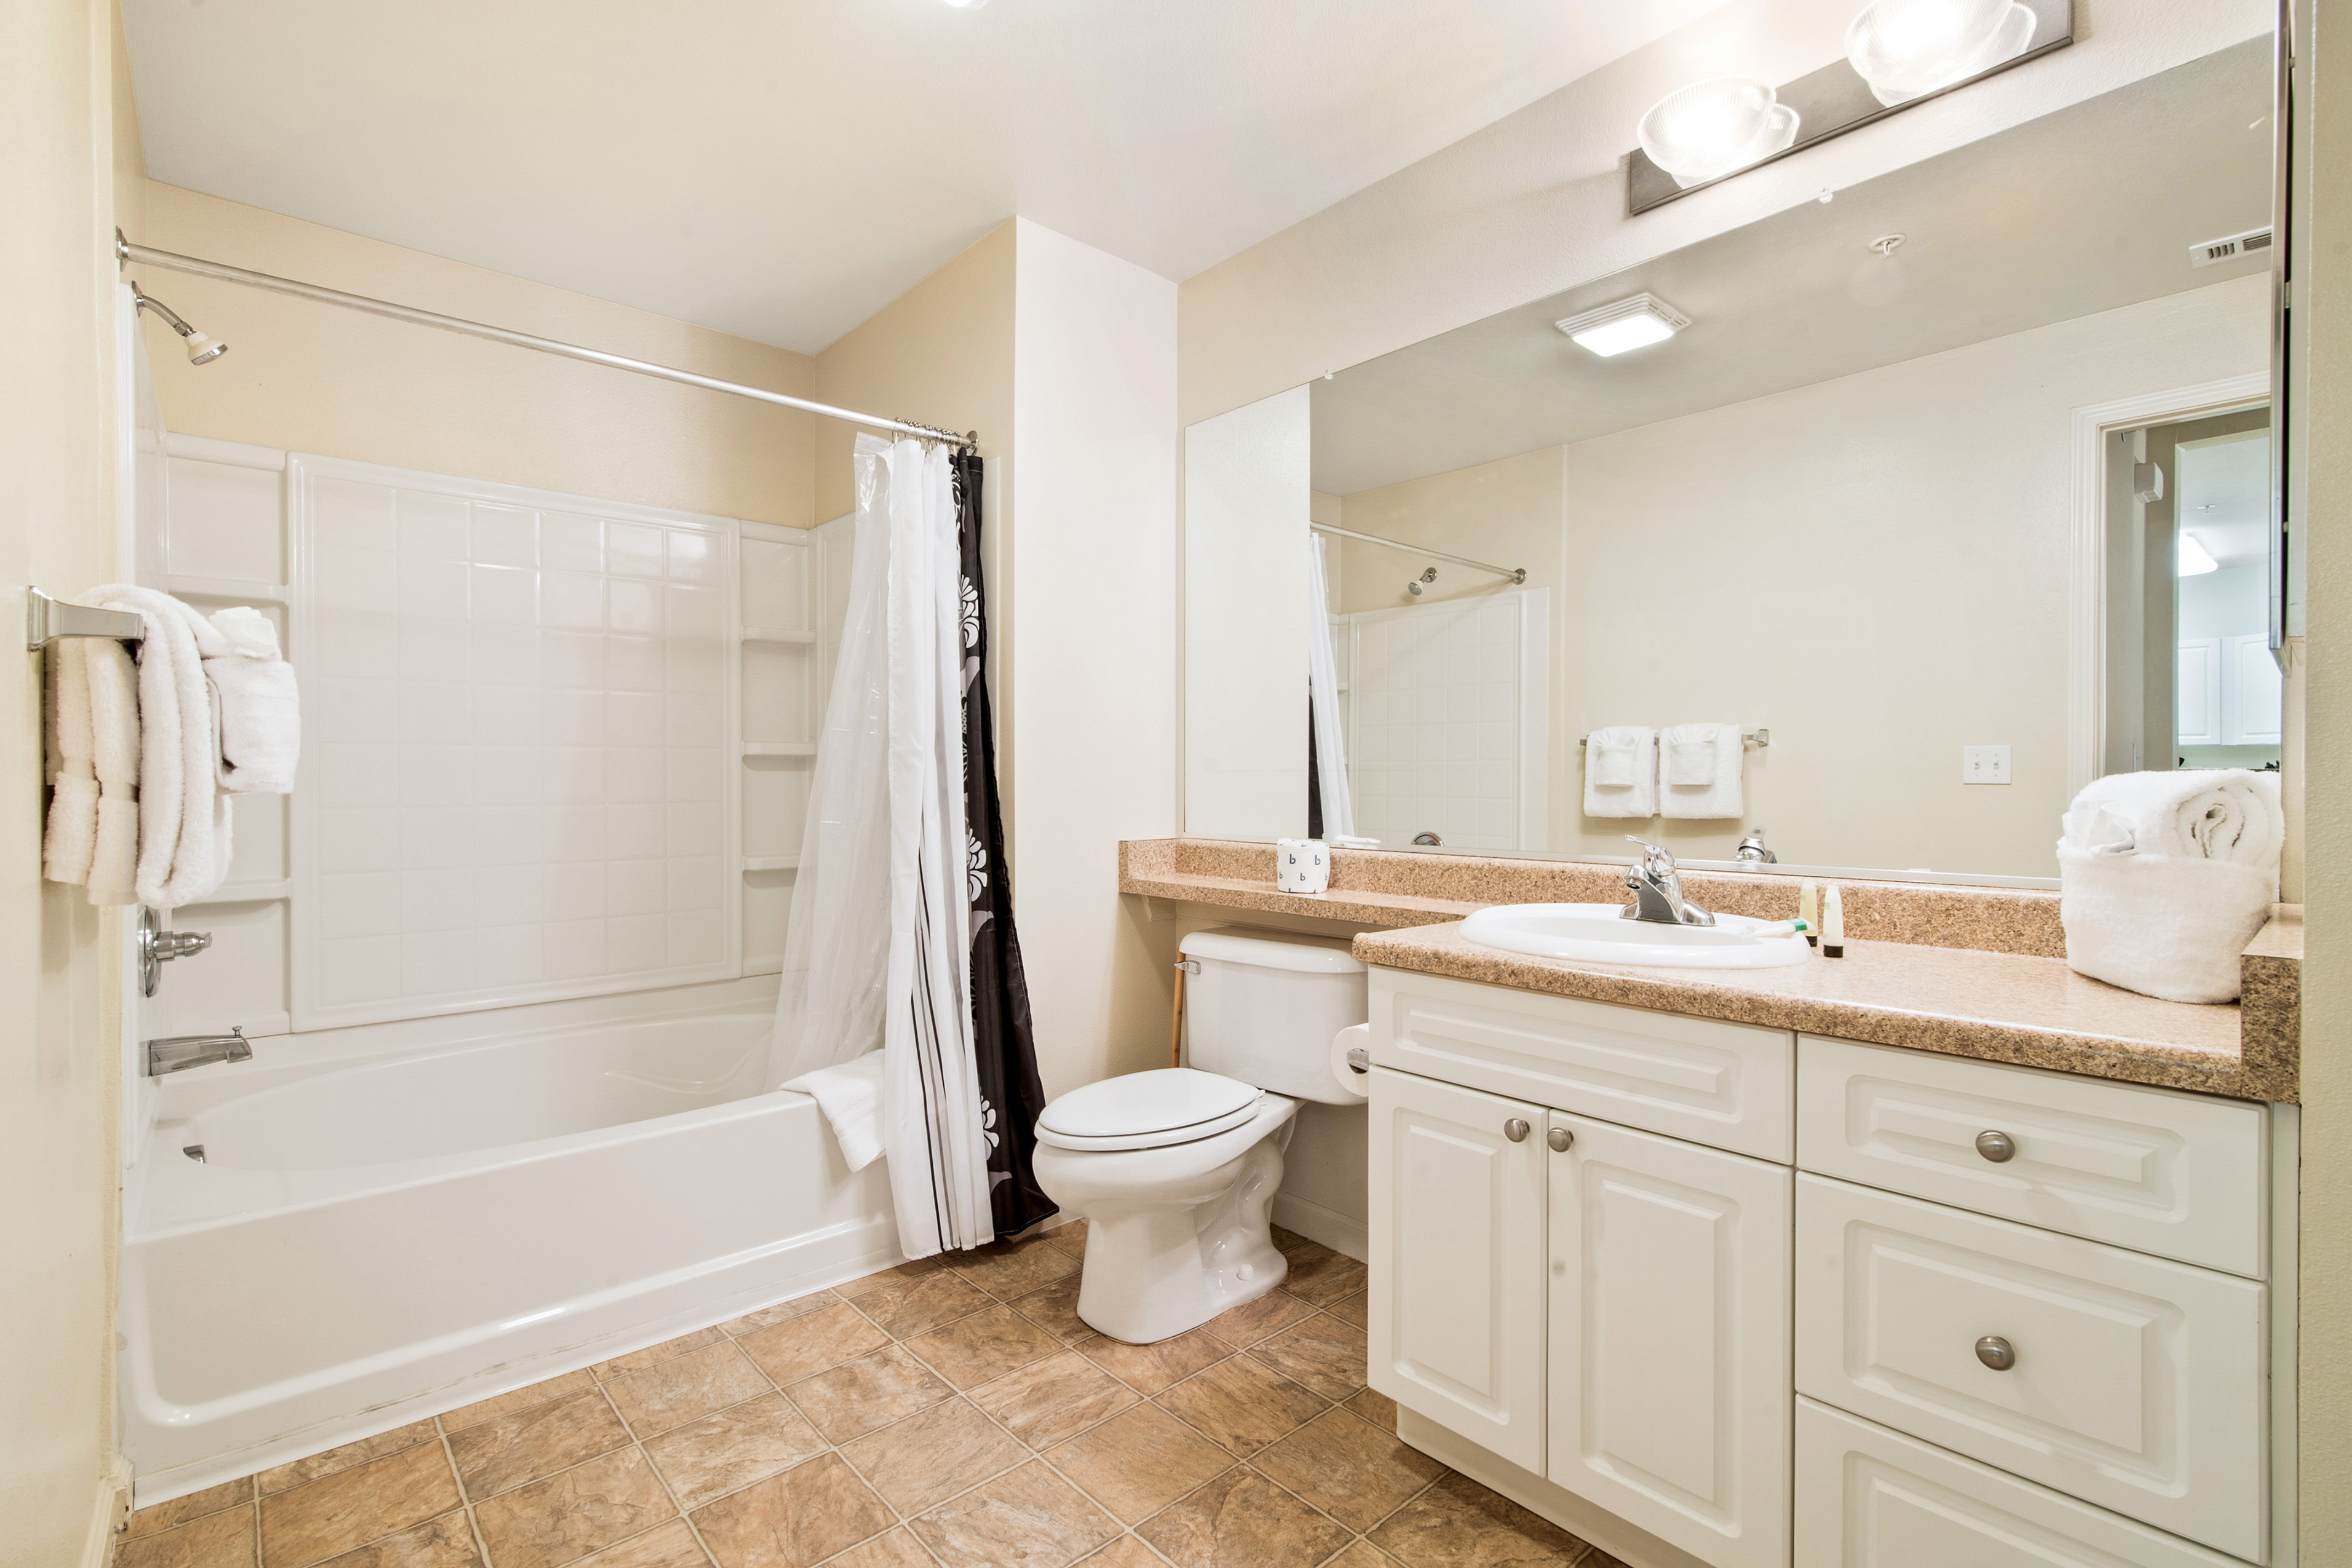 image 7 furnished 2 bedroom Apartment for rent in Santa Clara, Santa Clara County